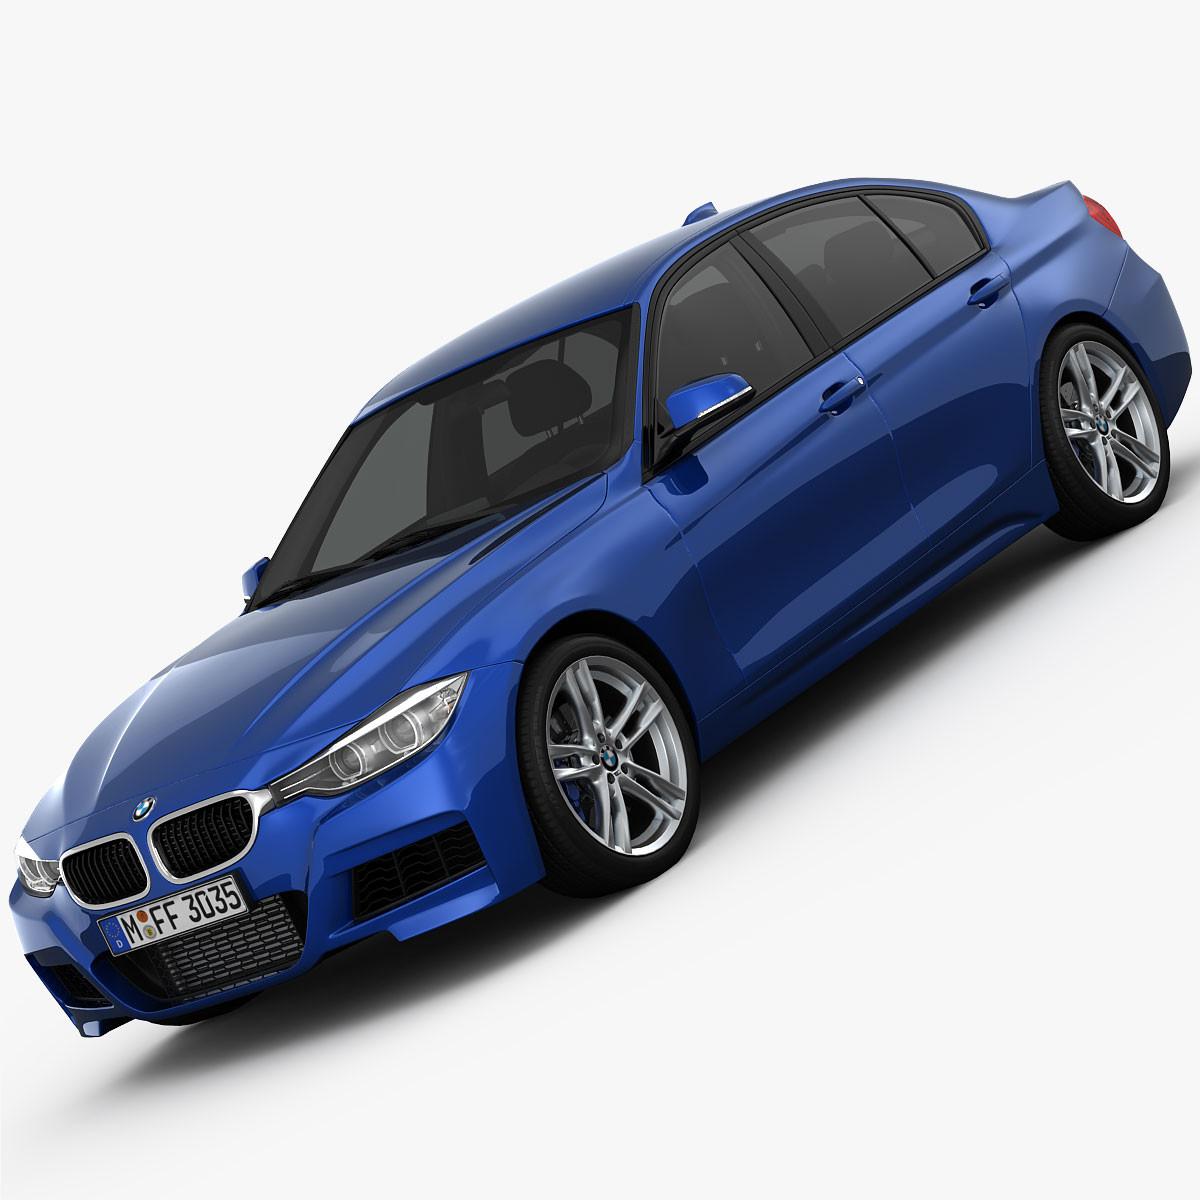 BMW-F30-MSport-1.jpg